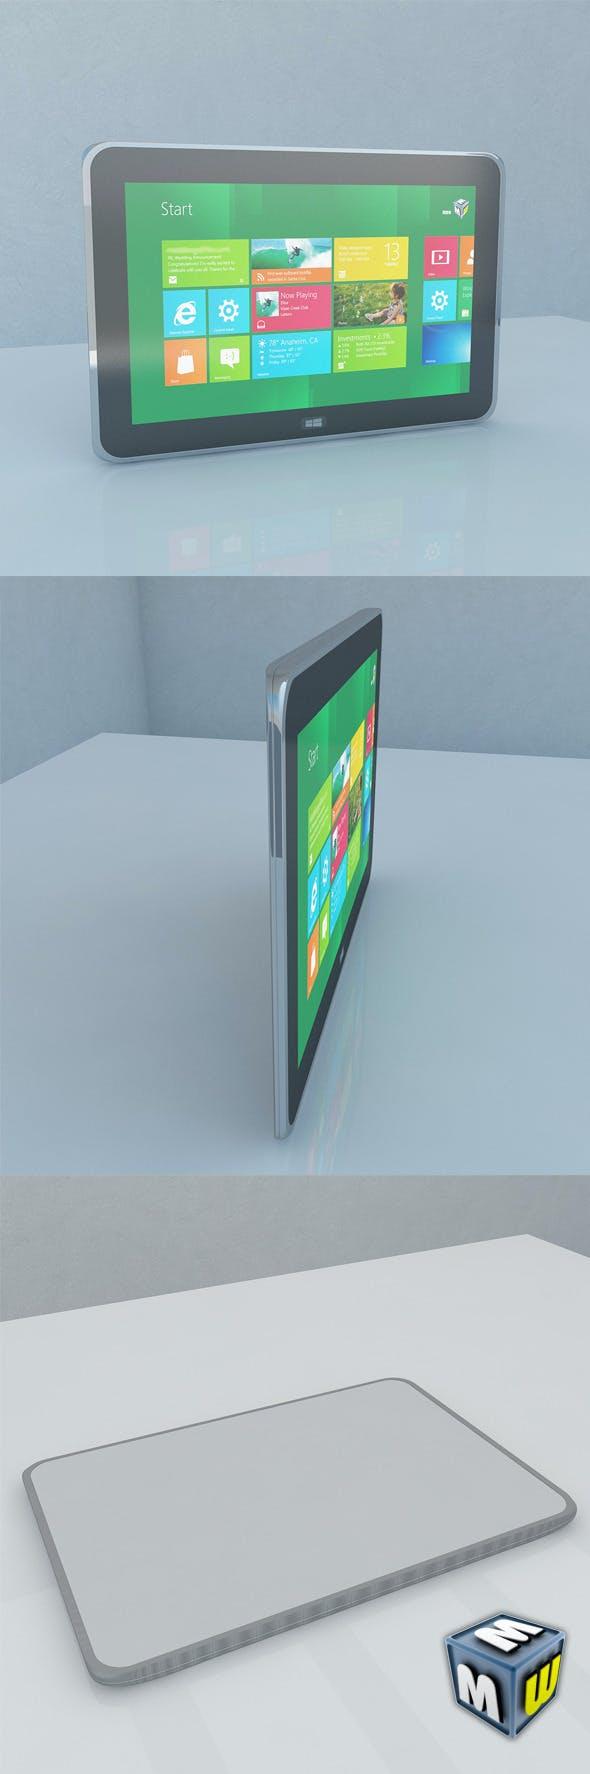 HP ElitePad MAX 2011 - 3DOcean Item for Sale